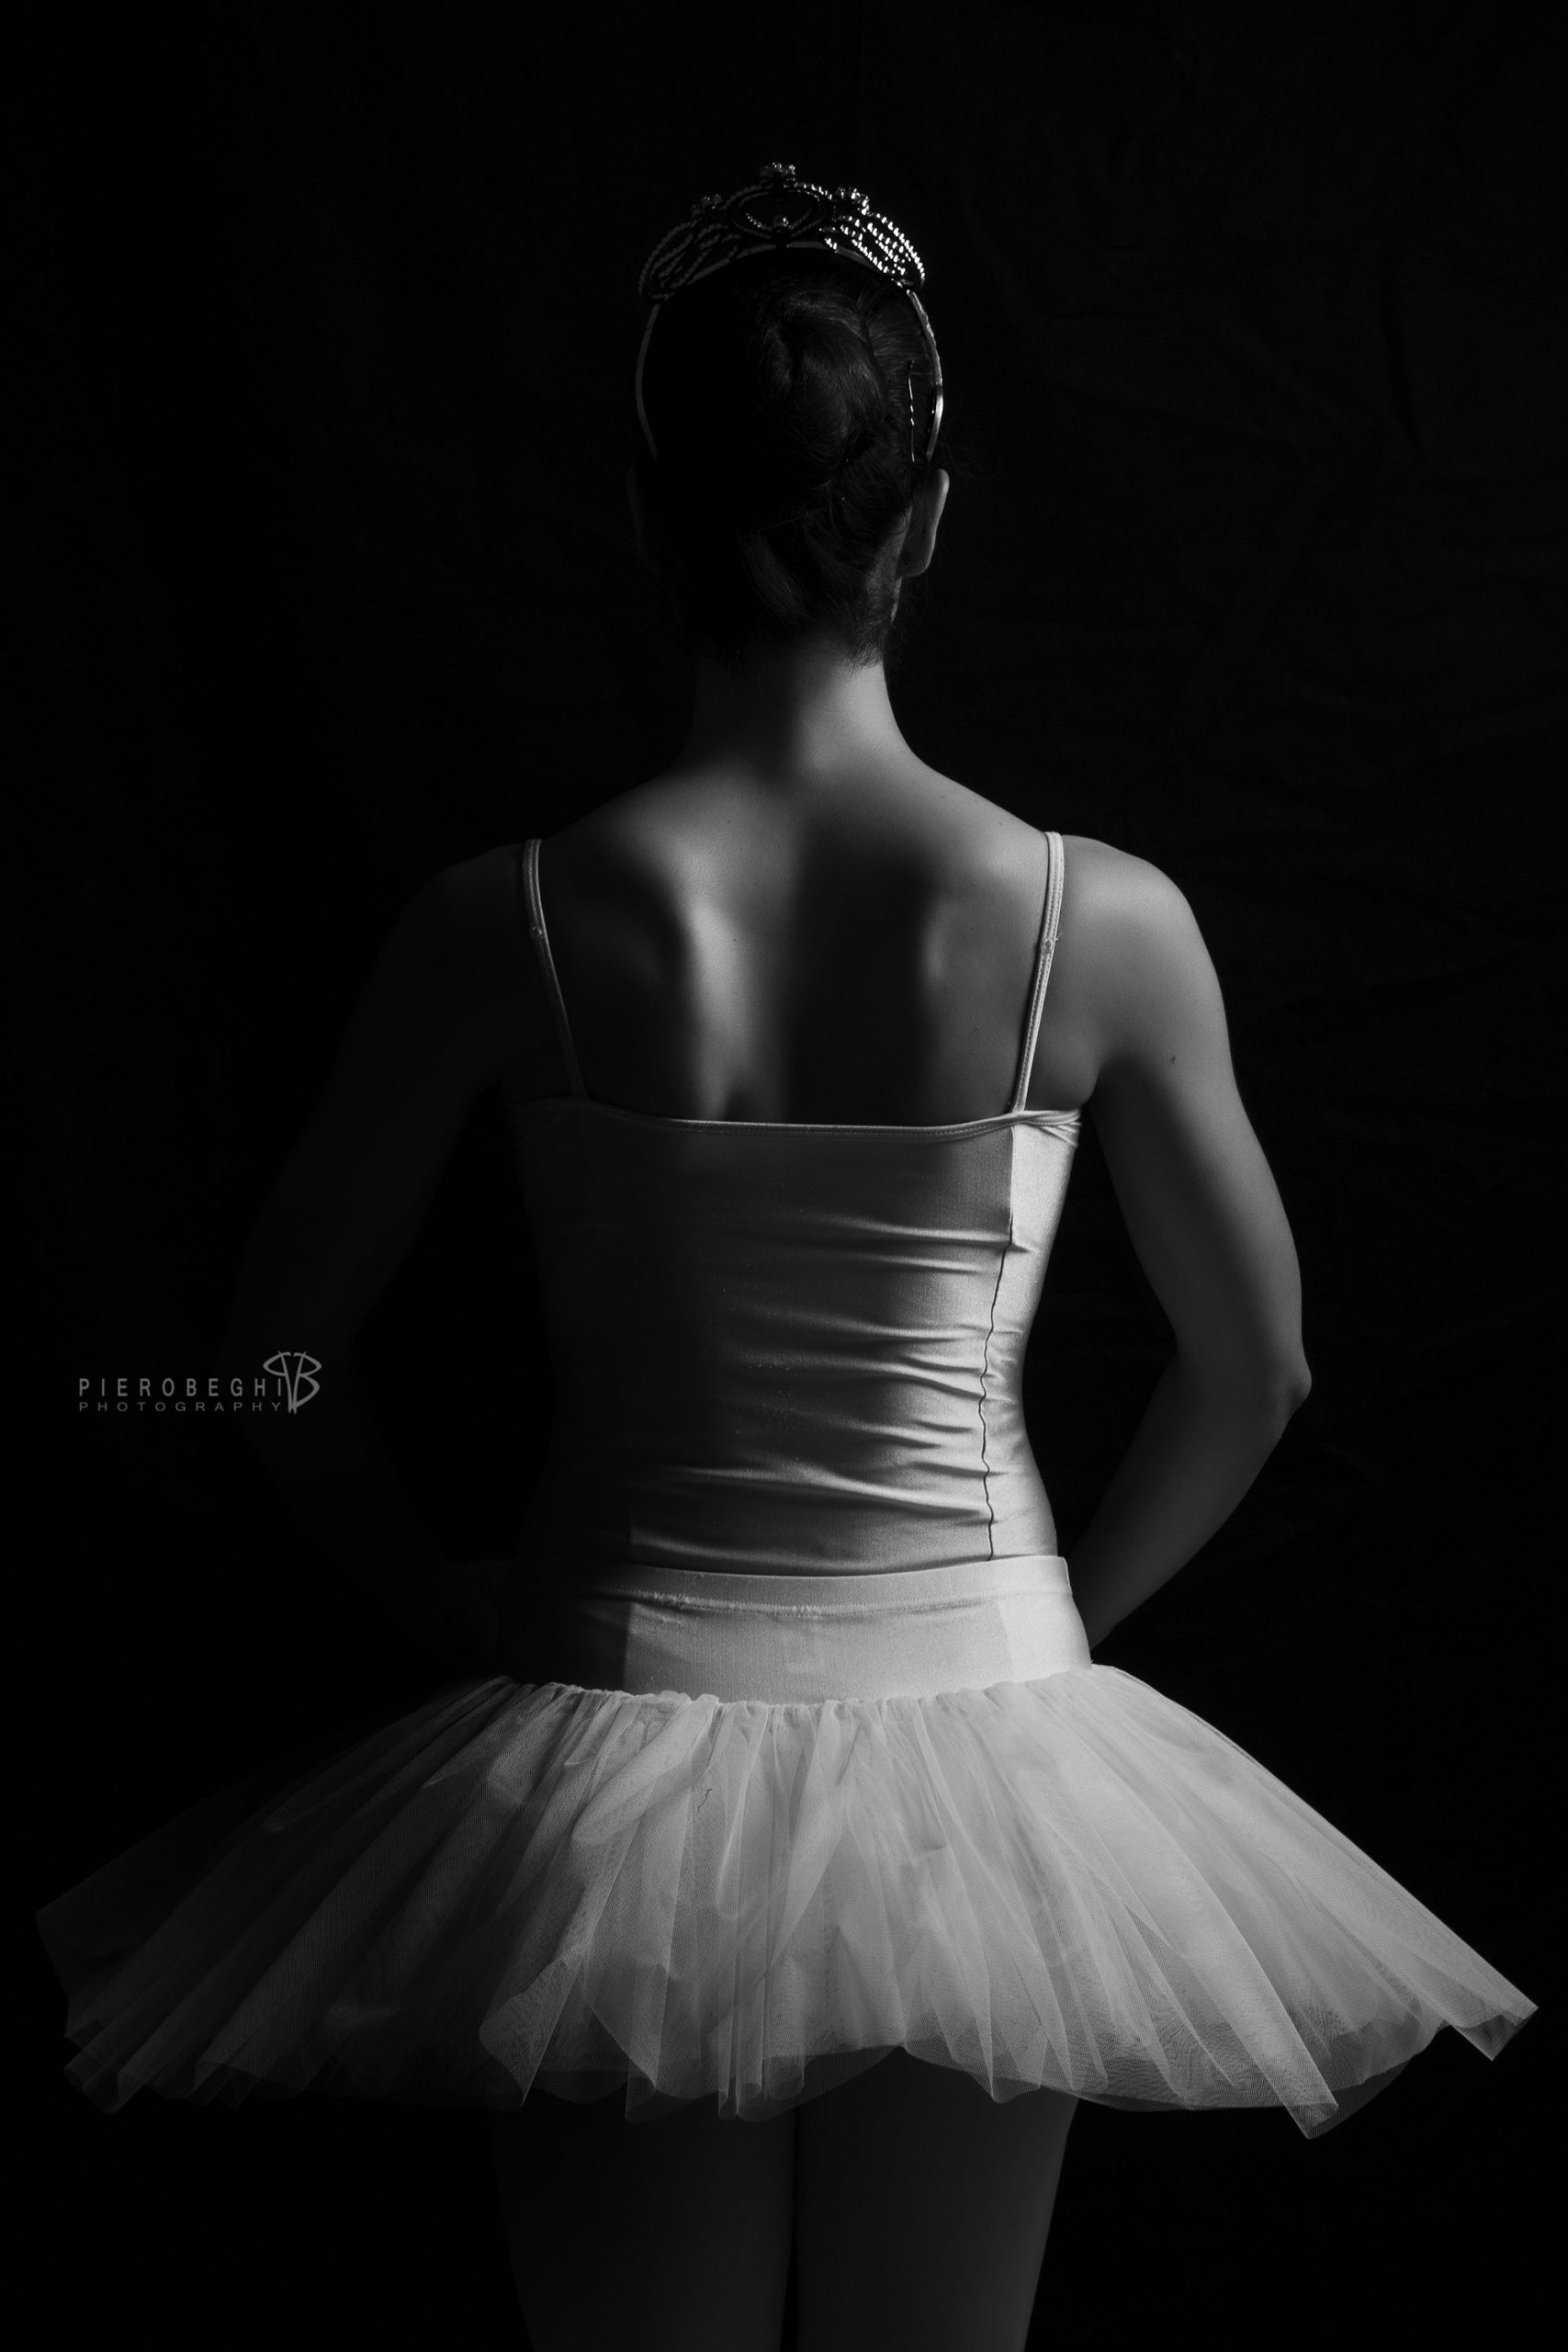 Categorie: Fine Art, Glamour, Portrait; Photographer: PIERO BEGHI; Model: VALENTINA CAU; Location: Ghedi, BS, Italia